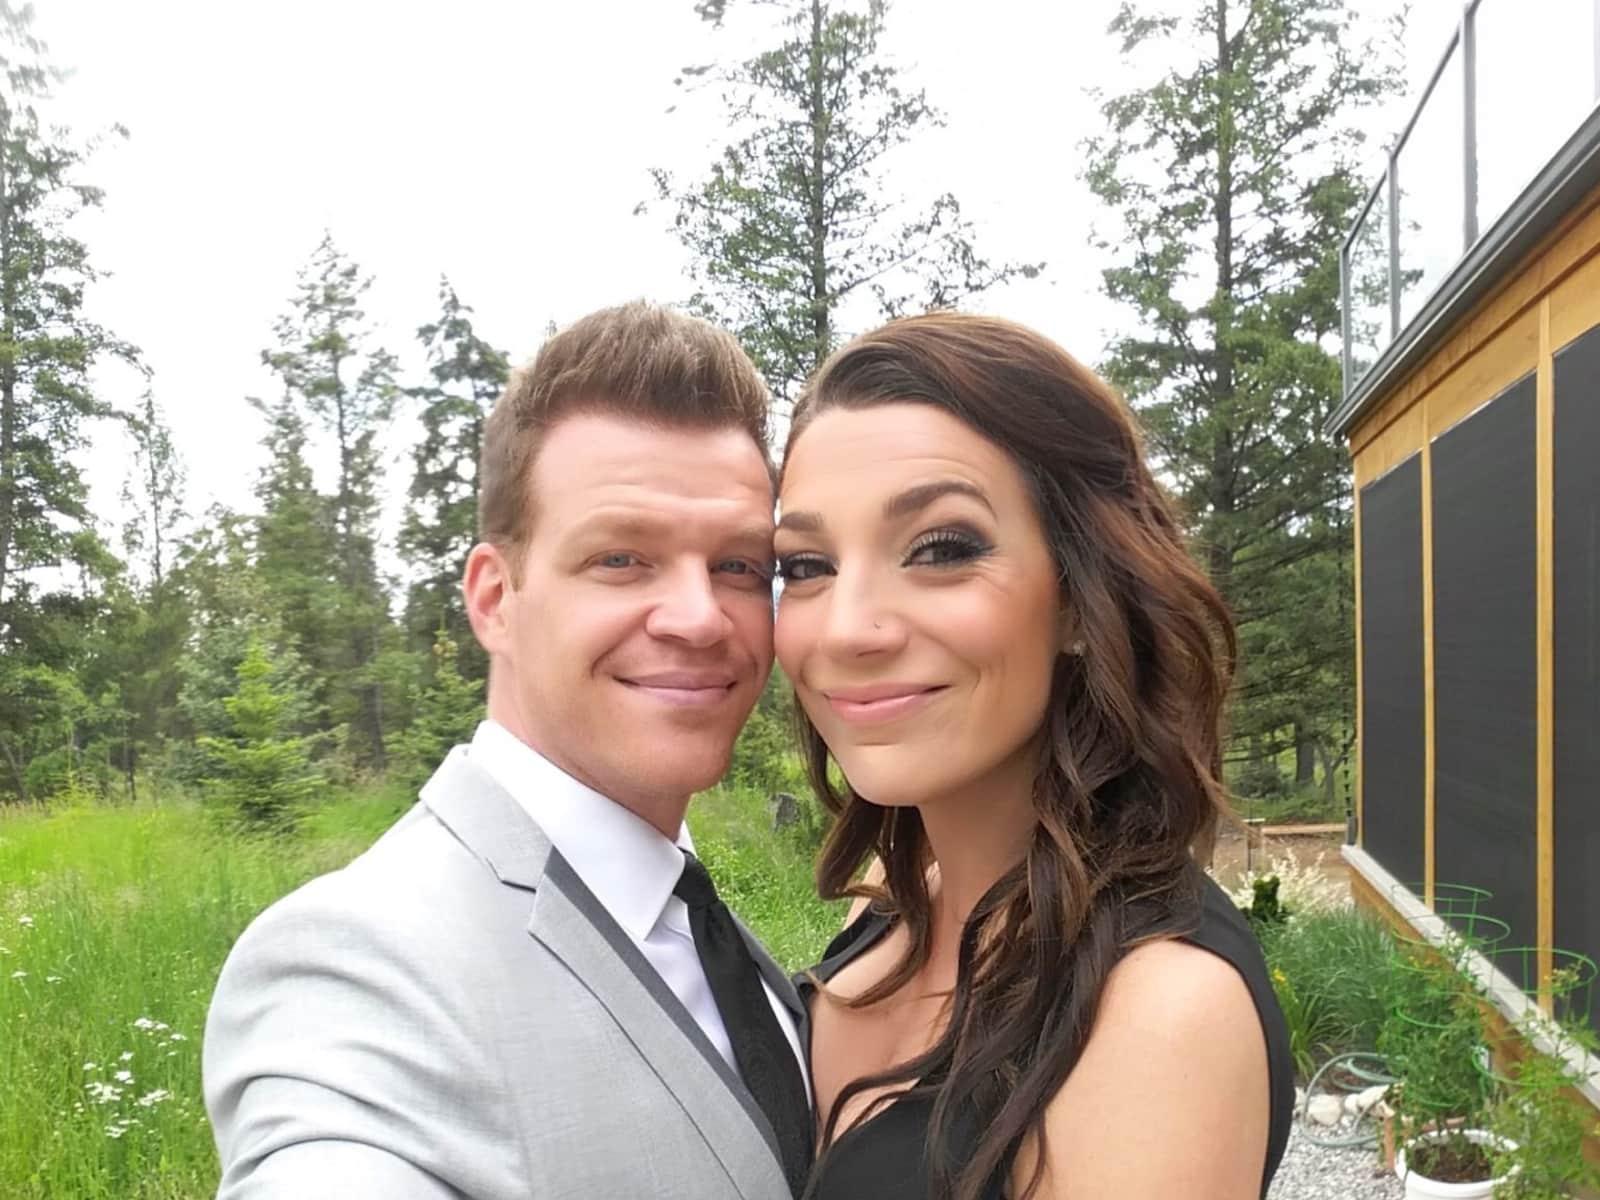 Alison & Andrew from Calgary, Alberta, Canada